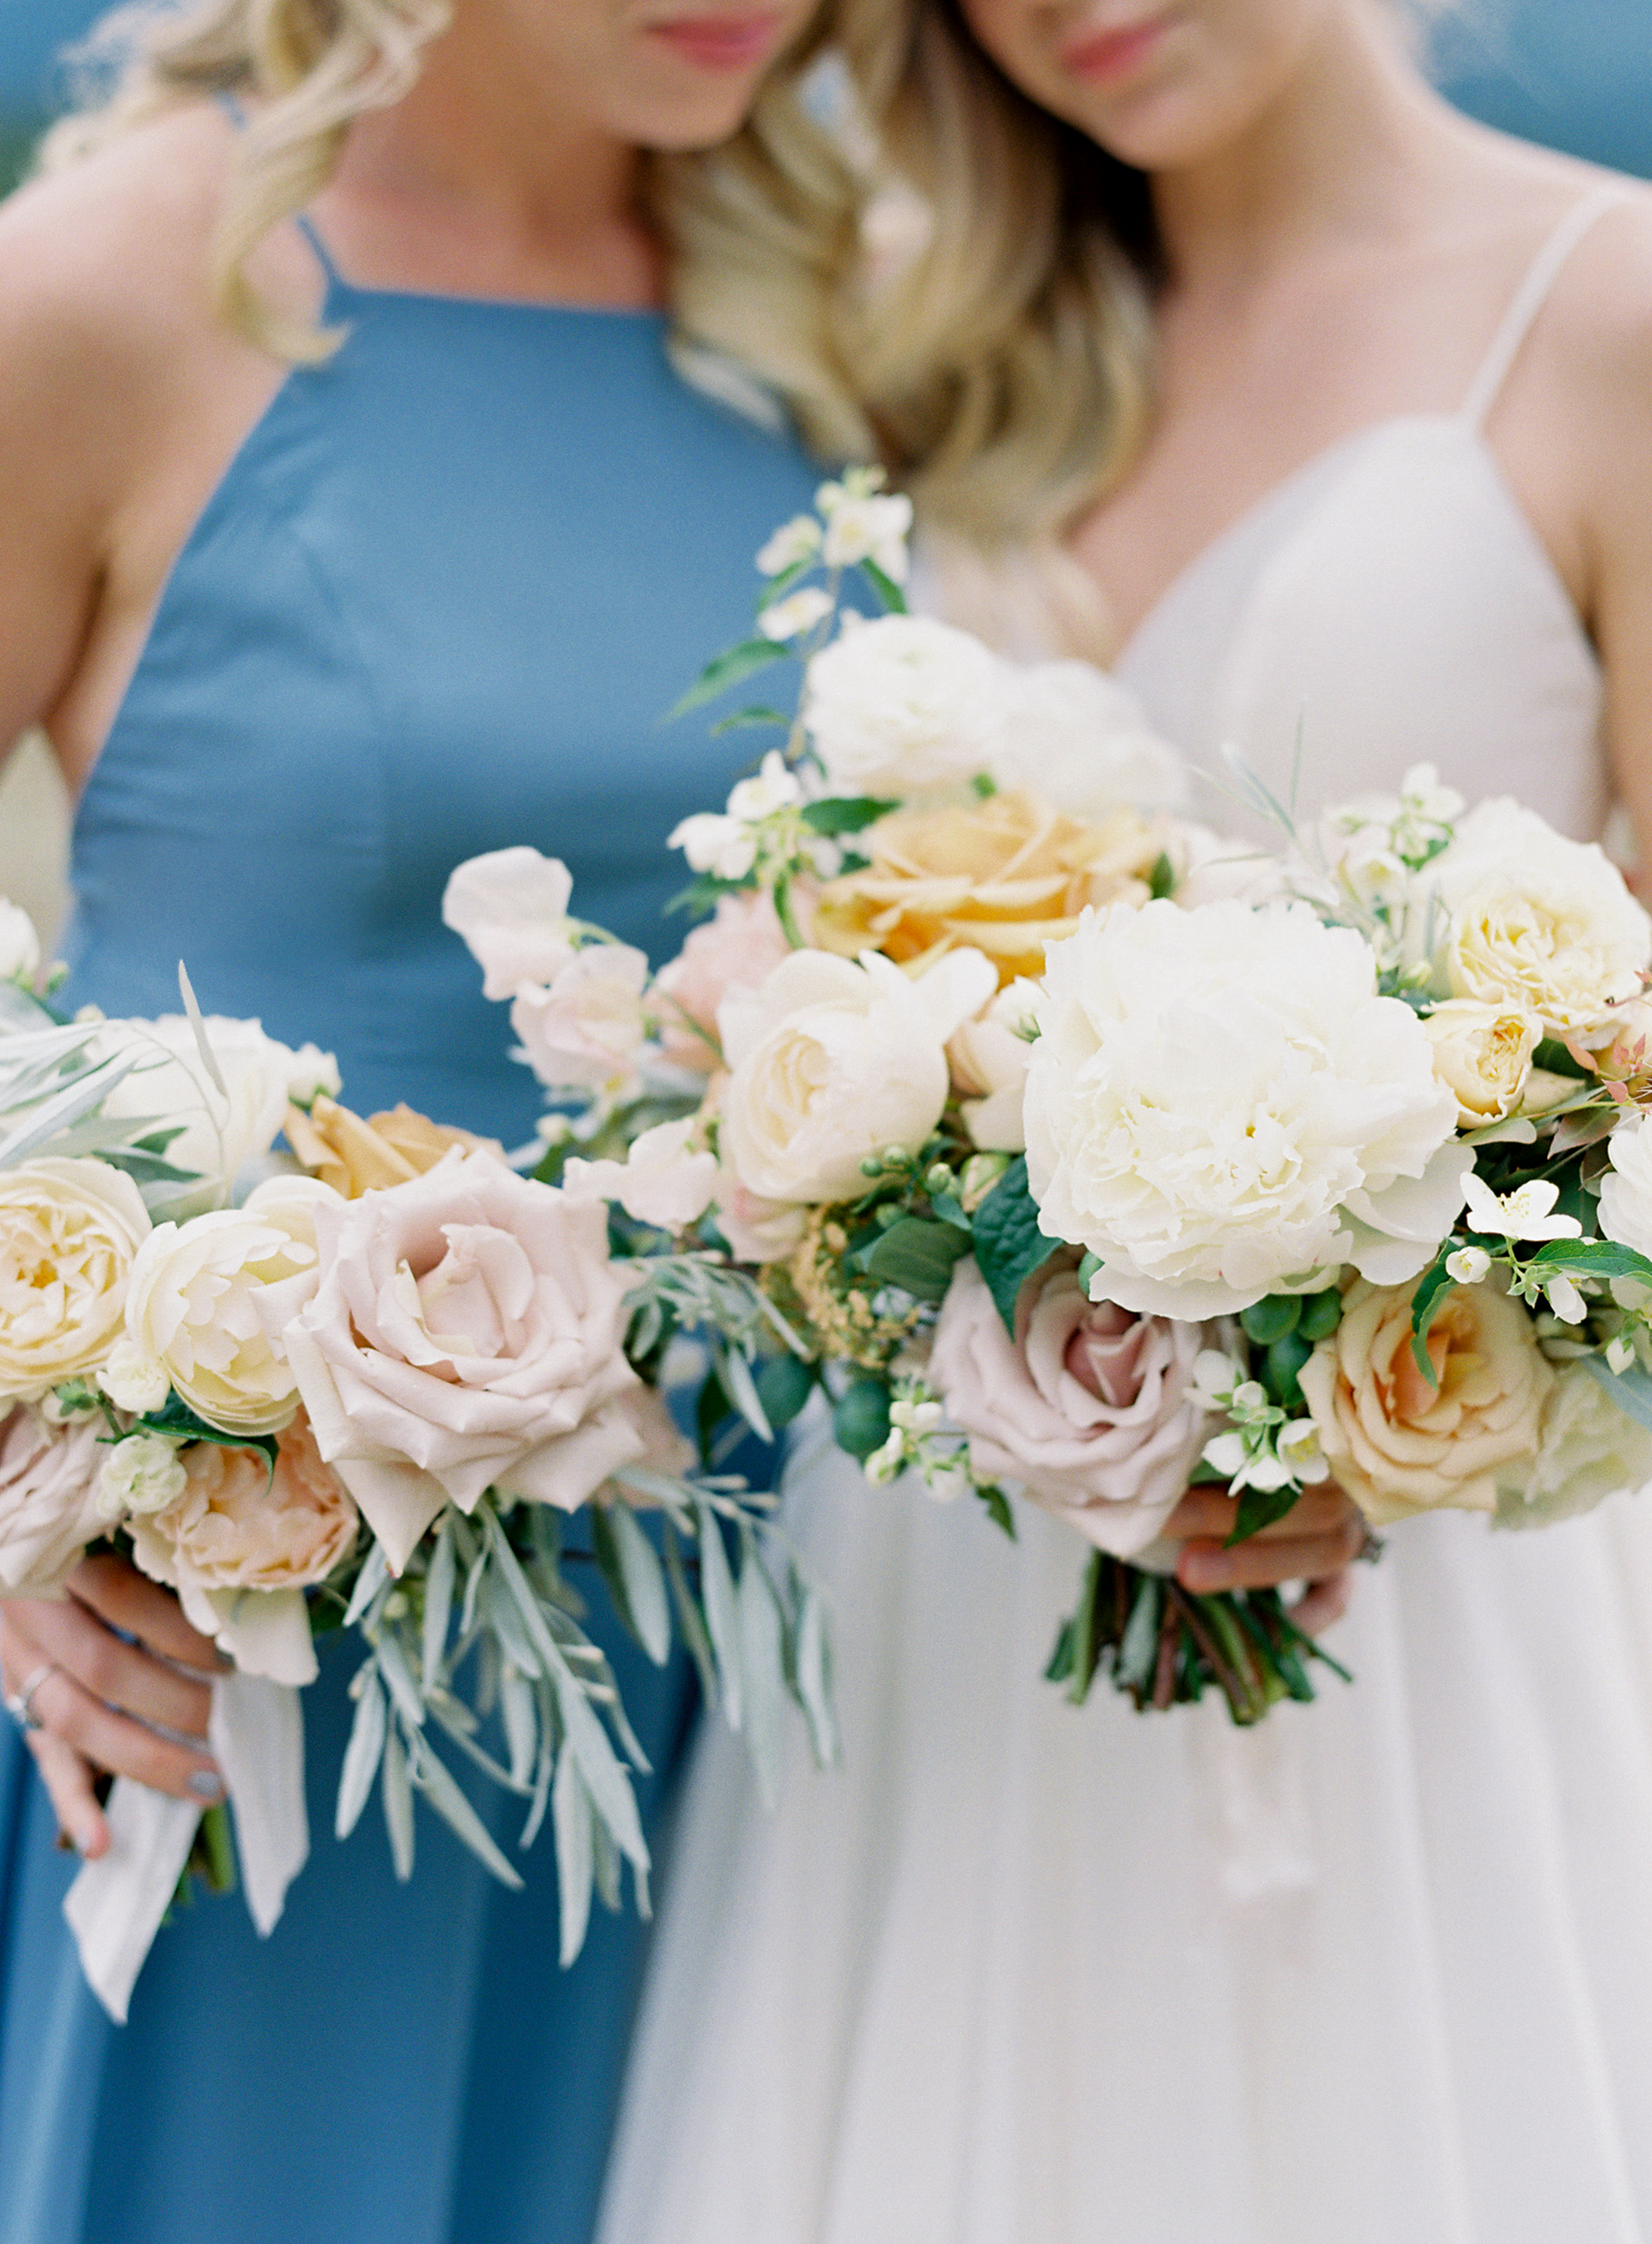 Jessica and Thomas-Wedding-Carrie King Photographer-20.jpg